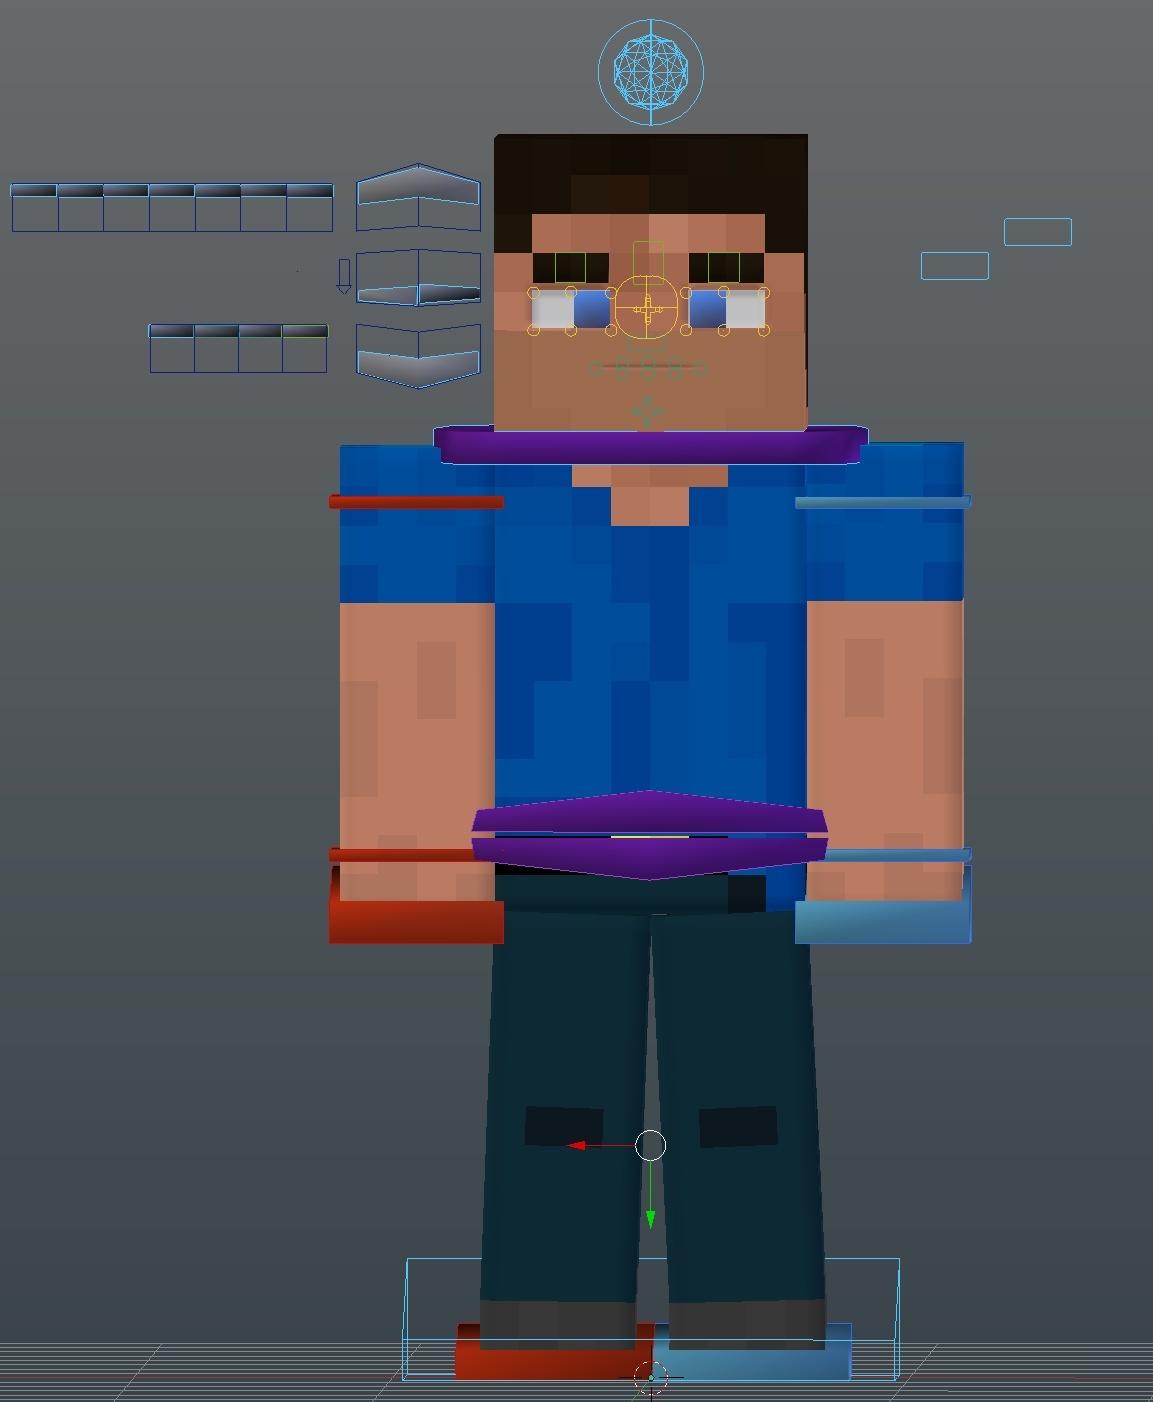 (Blender) LimetteDesigns Rig V4